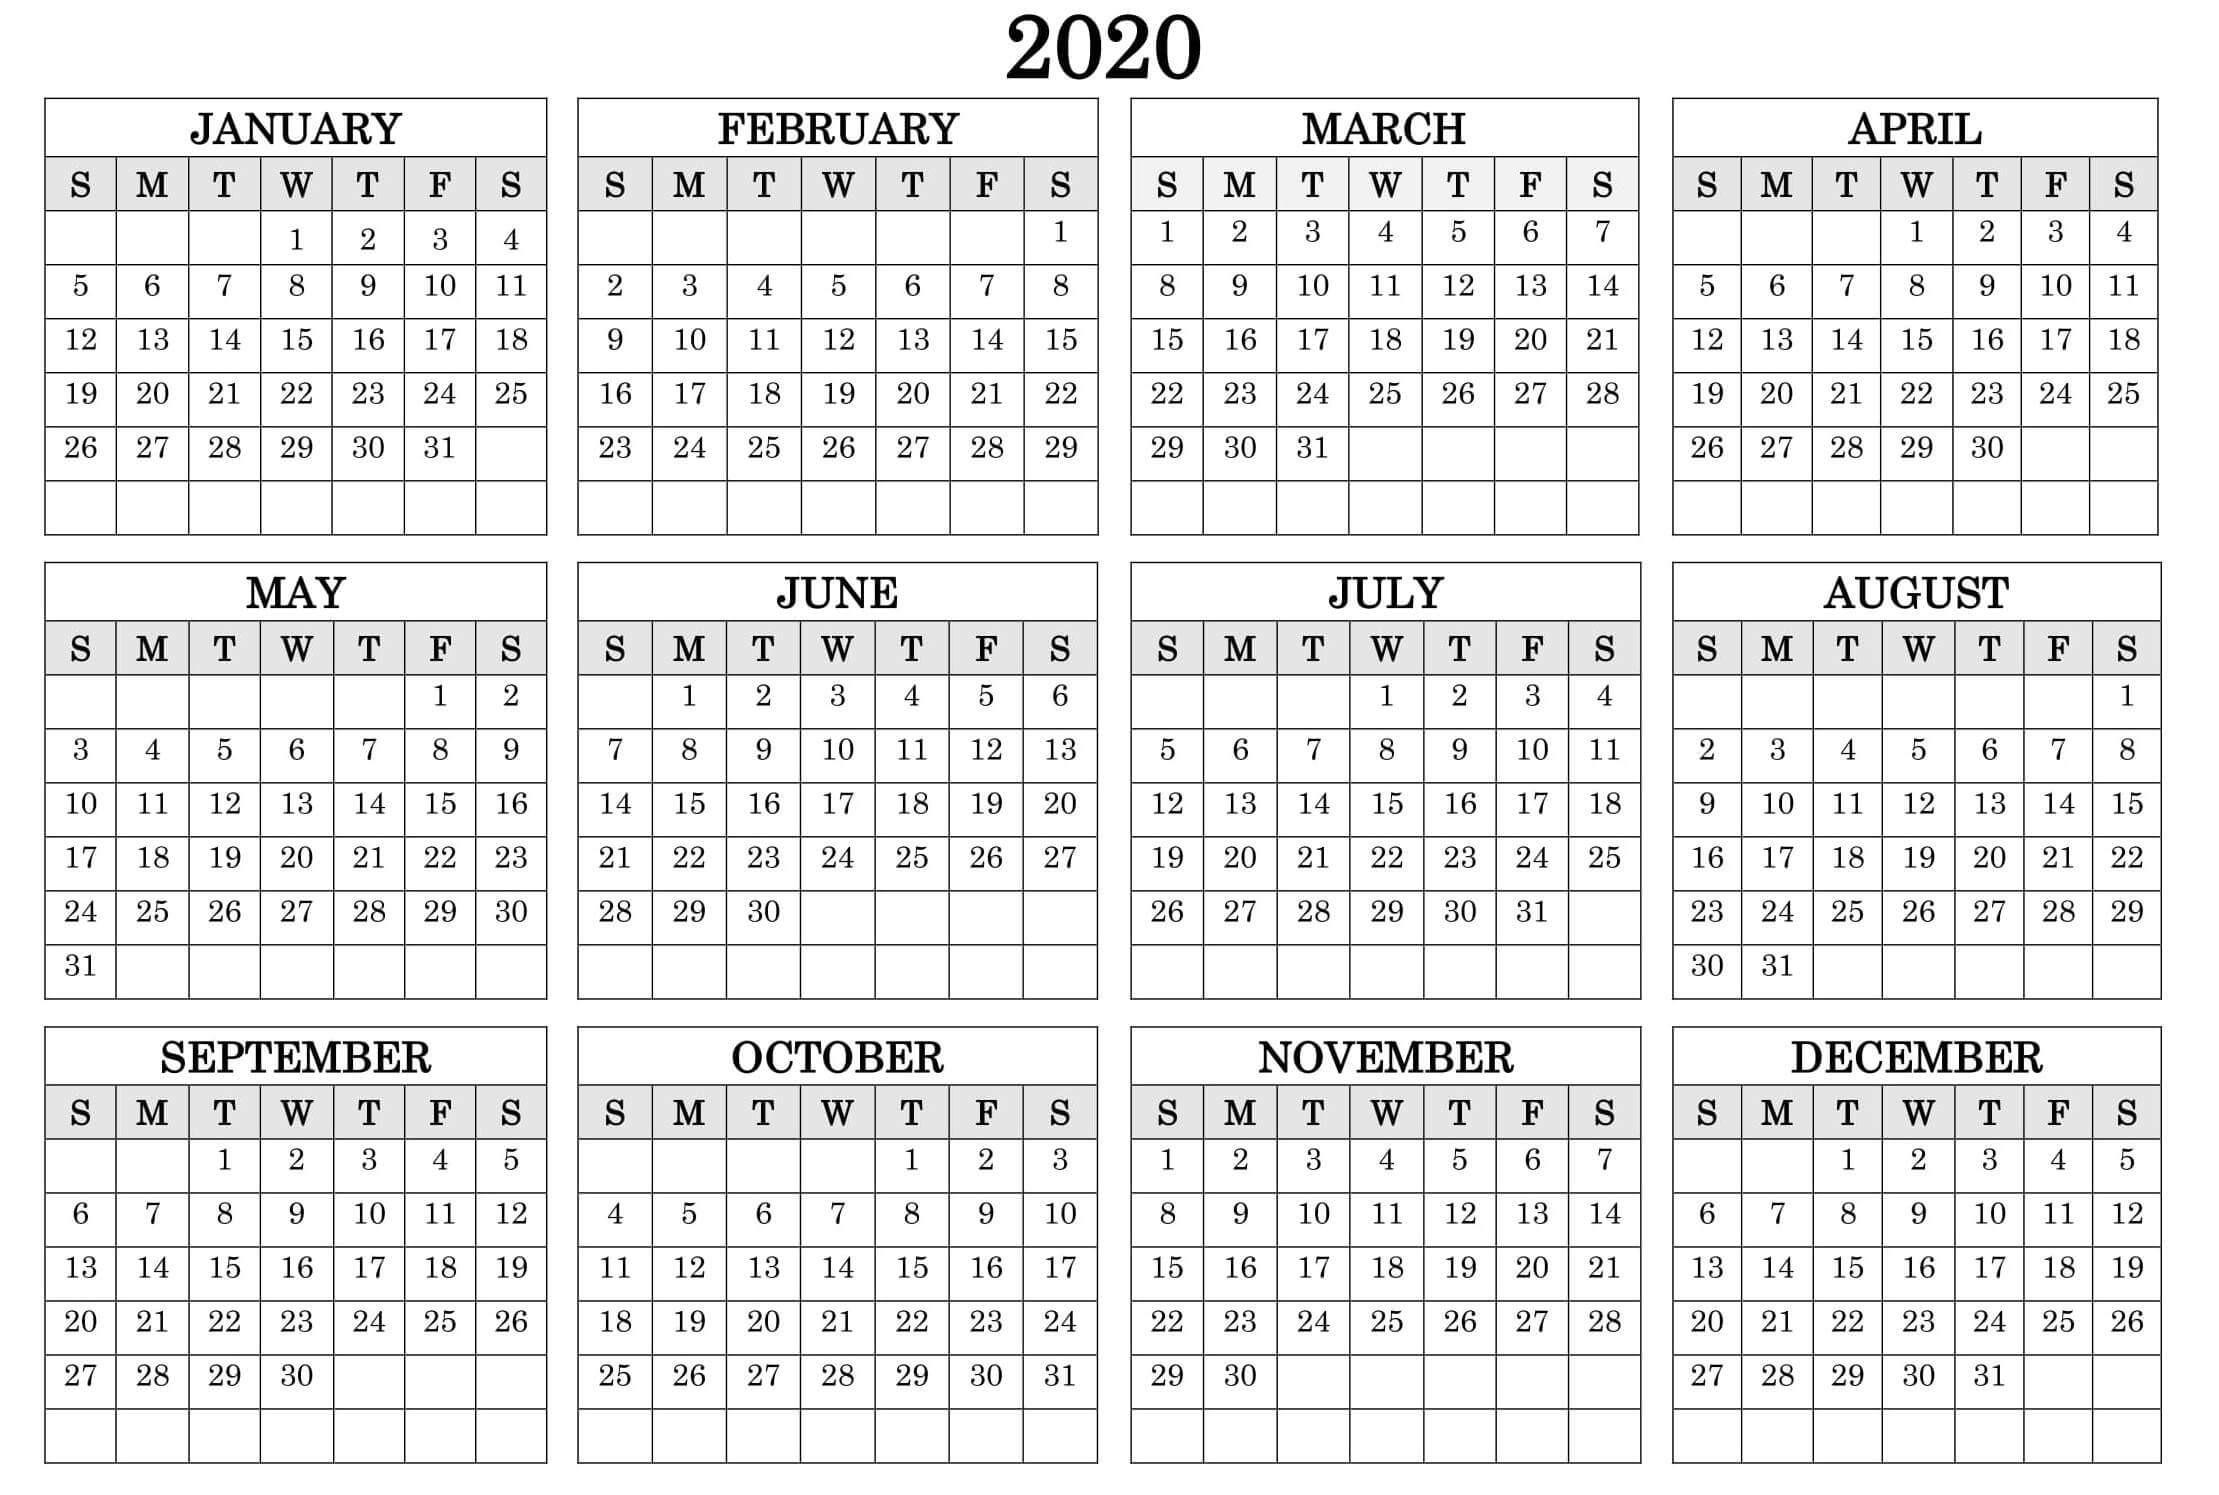 Printable Calendar Year 2020 Holidays Fillable Pdf - Set-2020 Calendar Template Fillable Pdf